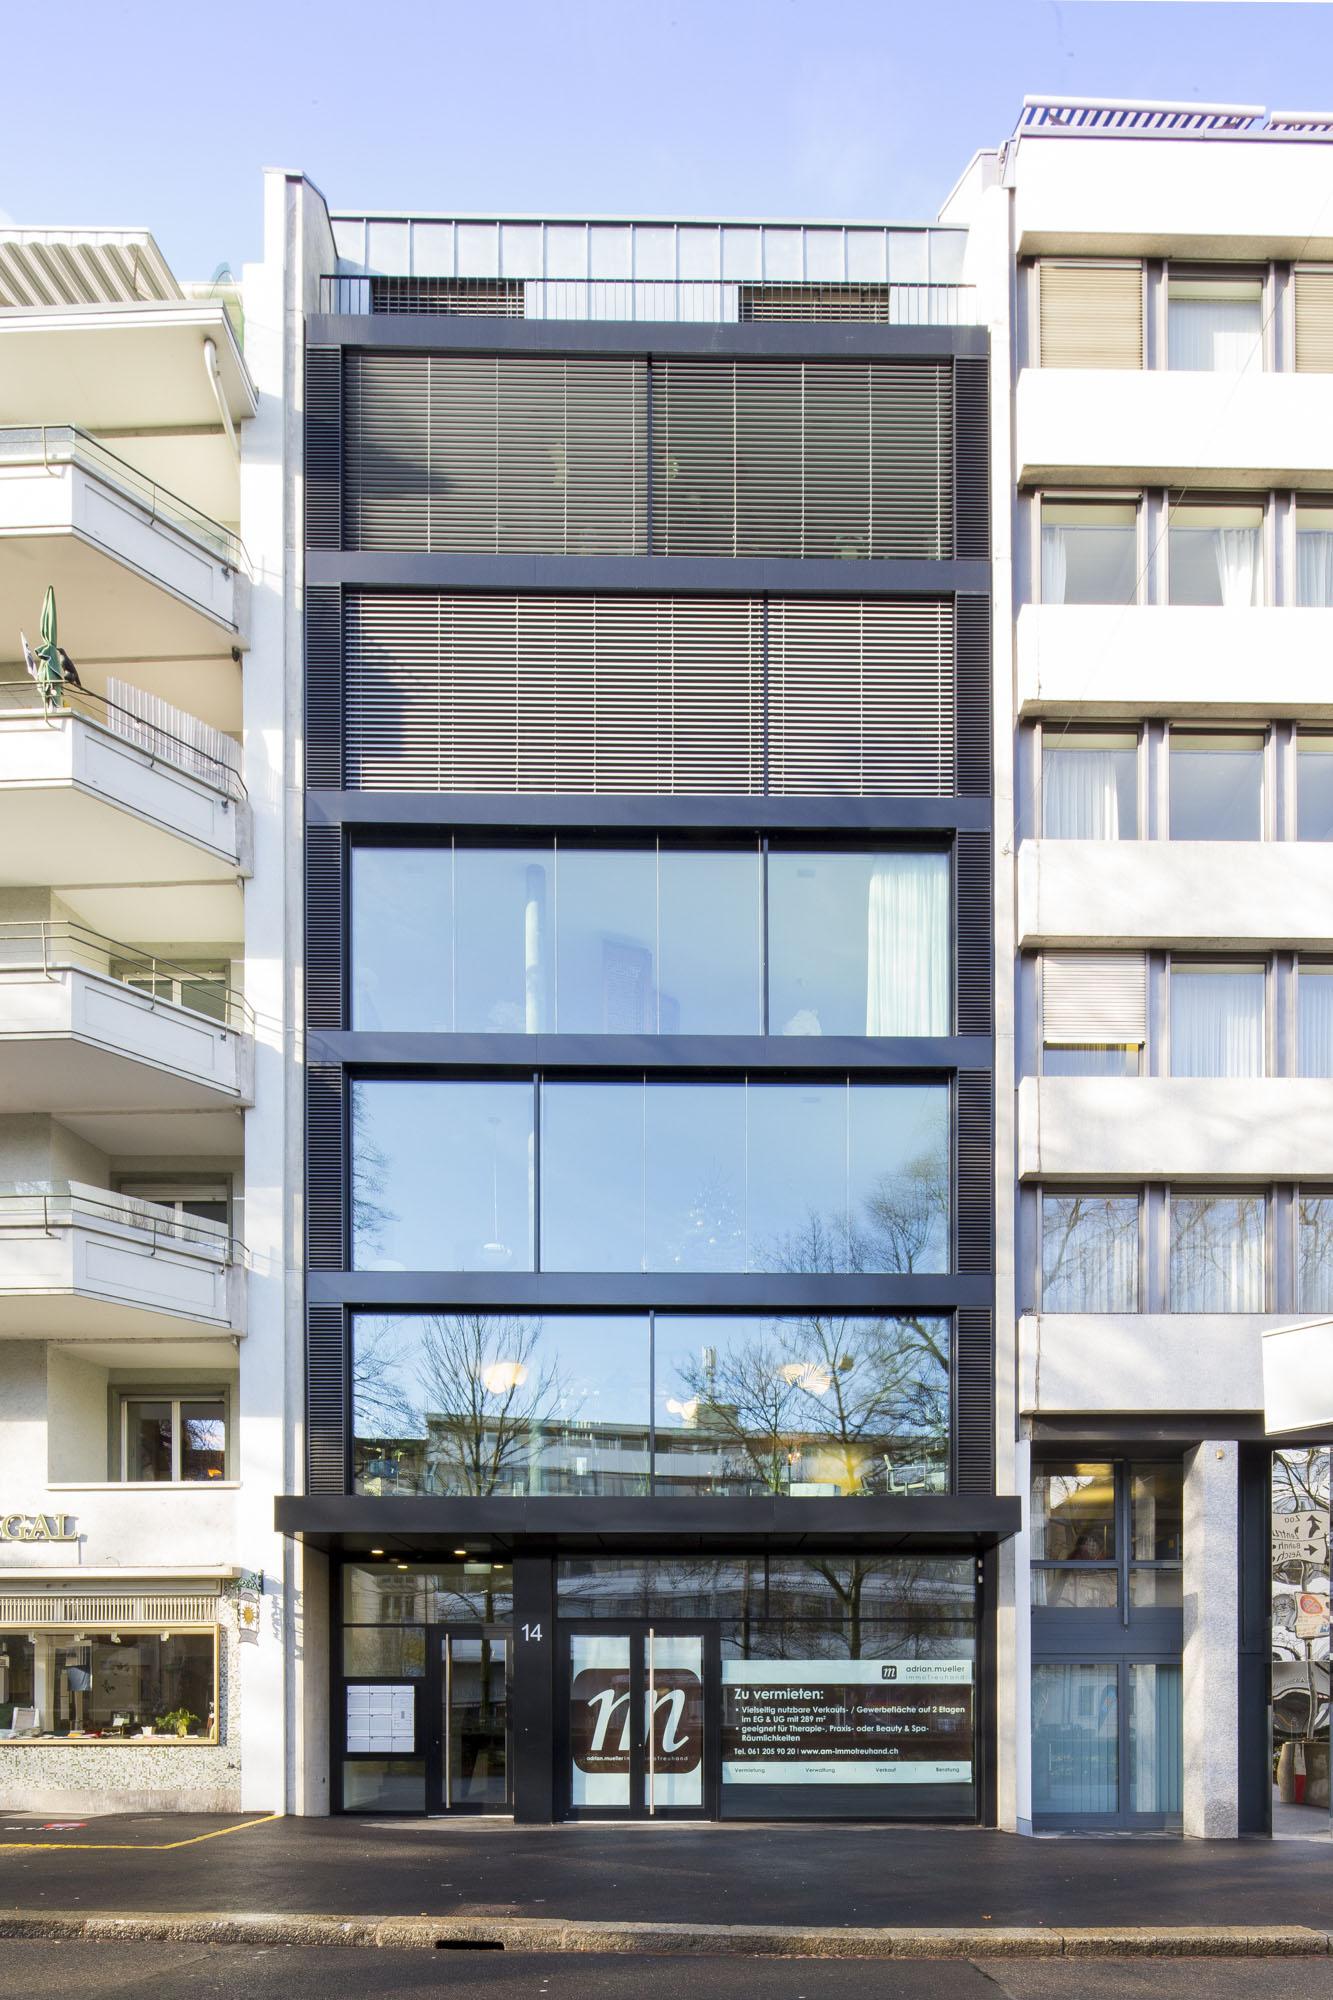 garibay, Aeschengraben 14, Basel